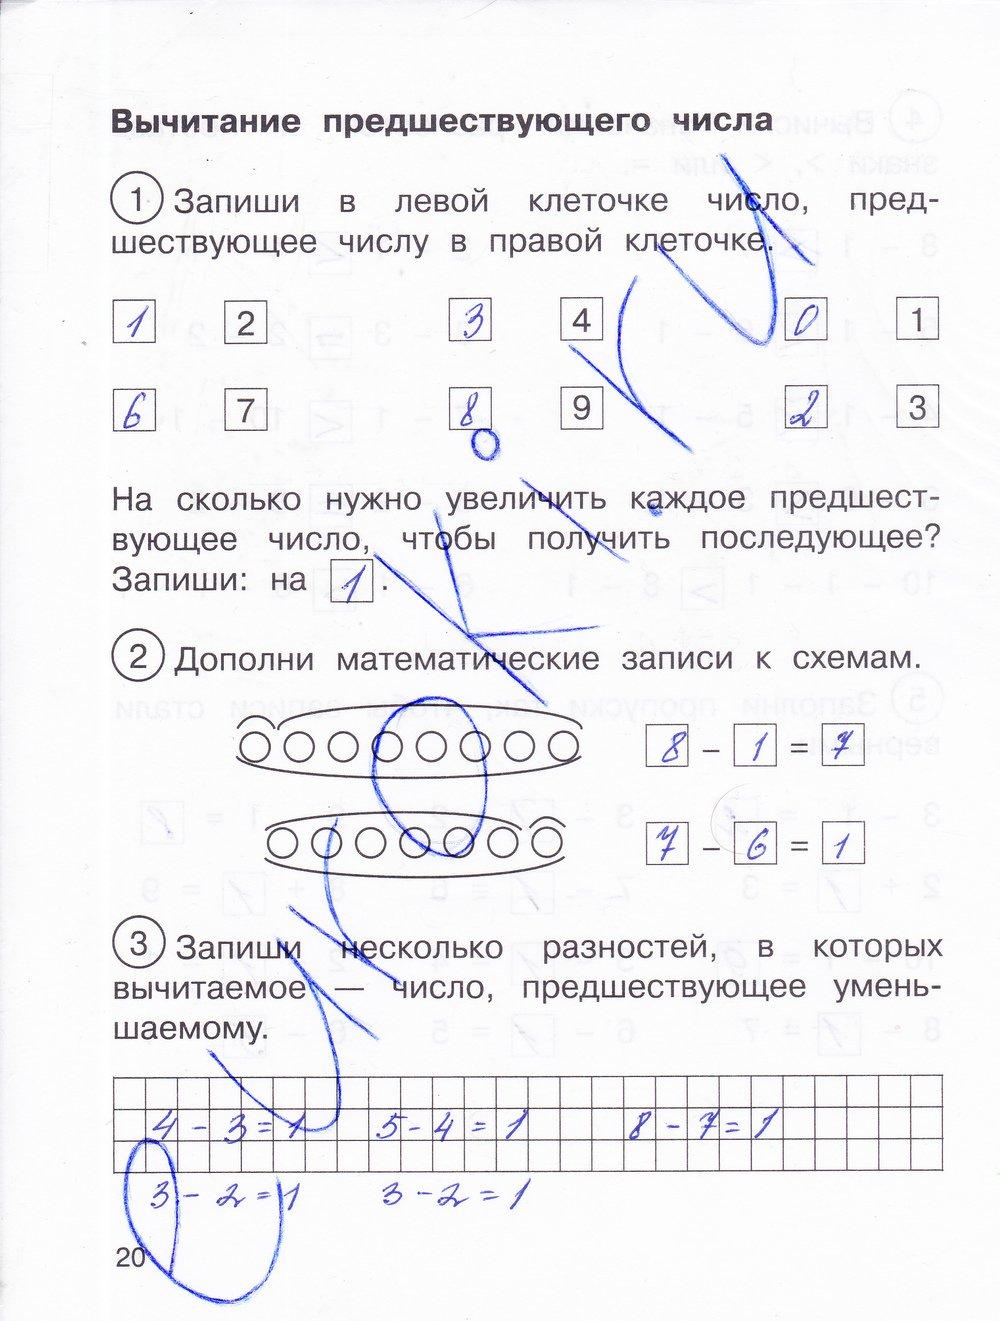 Решебник По Математике Тетрадь 1 Класс Захарова И Юдина